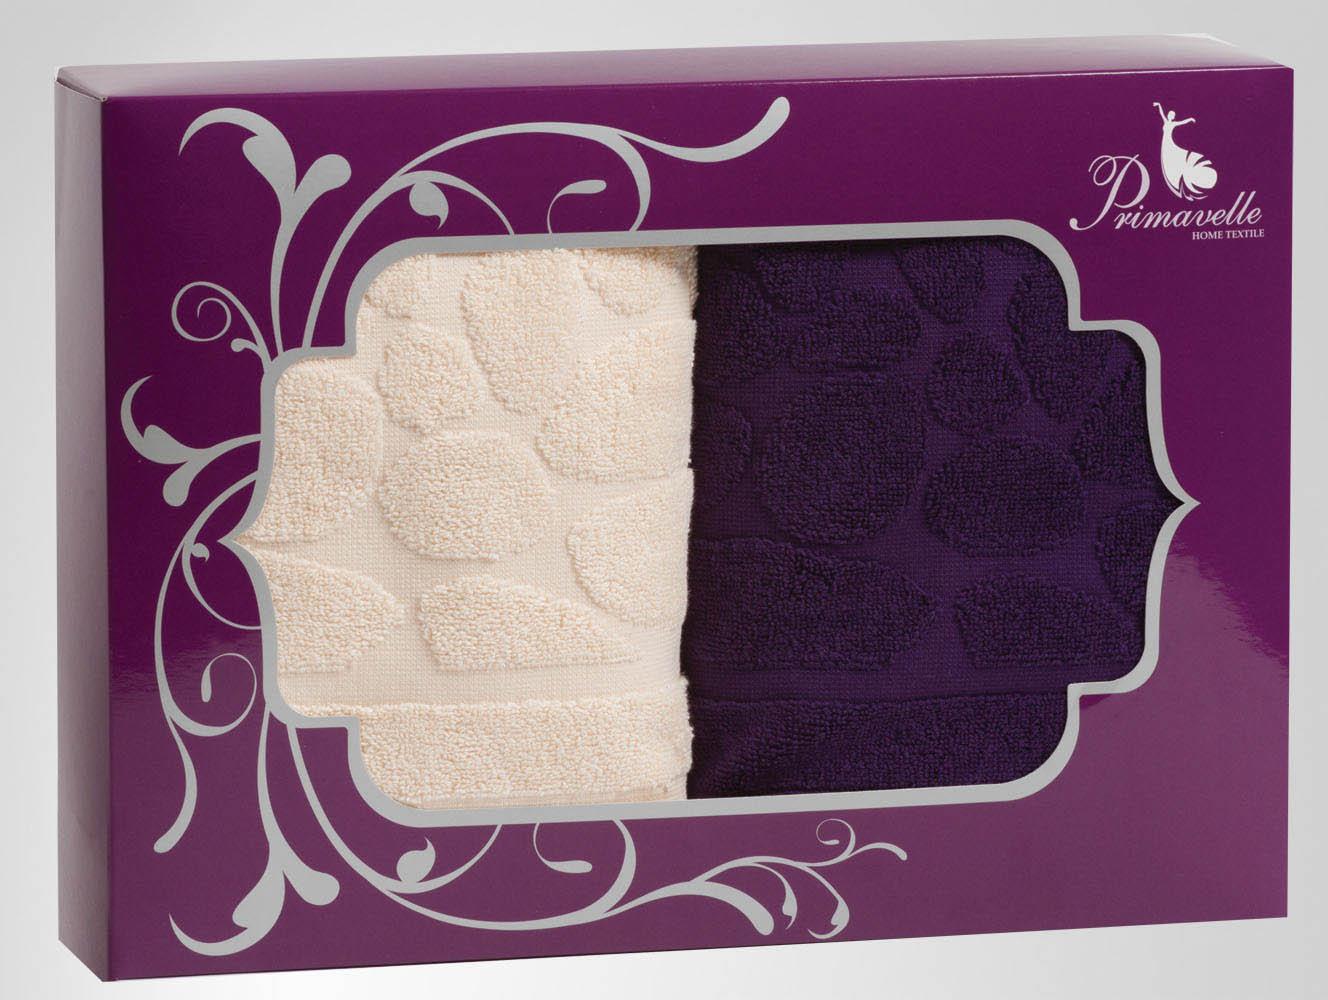 Полотенца Primavelle Полотенце Piera Цвет: Фиолетовый+Бежевый (50х90 см - 2 шт) цена и фото